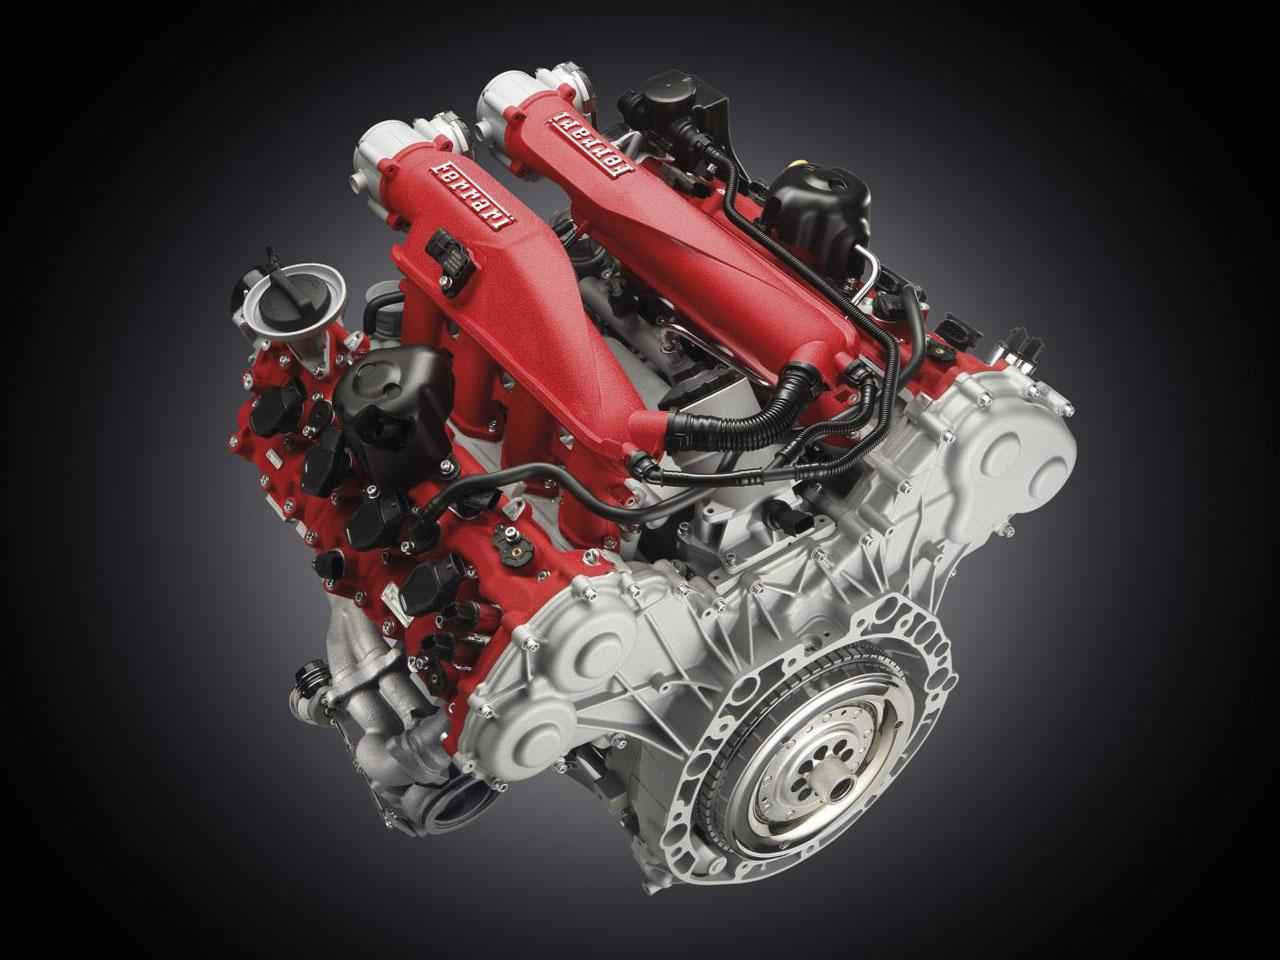 ferrari-488-gtb-engine-turbo-image